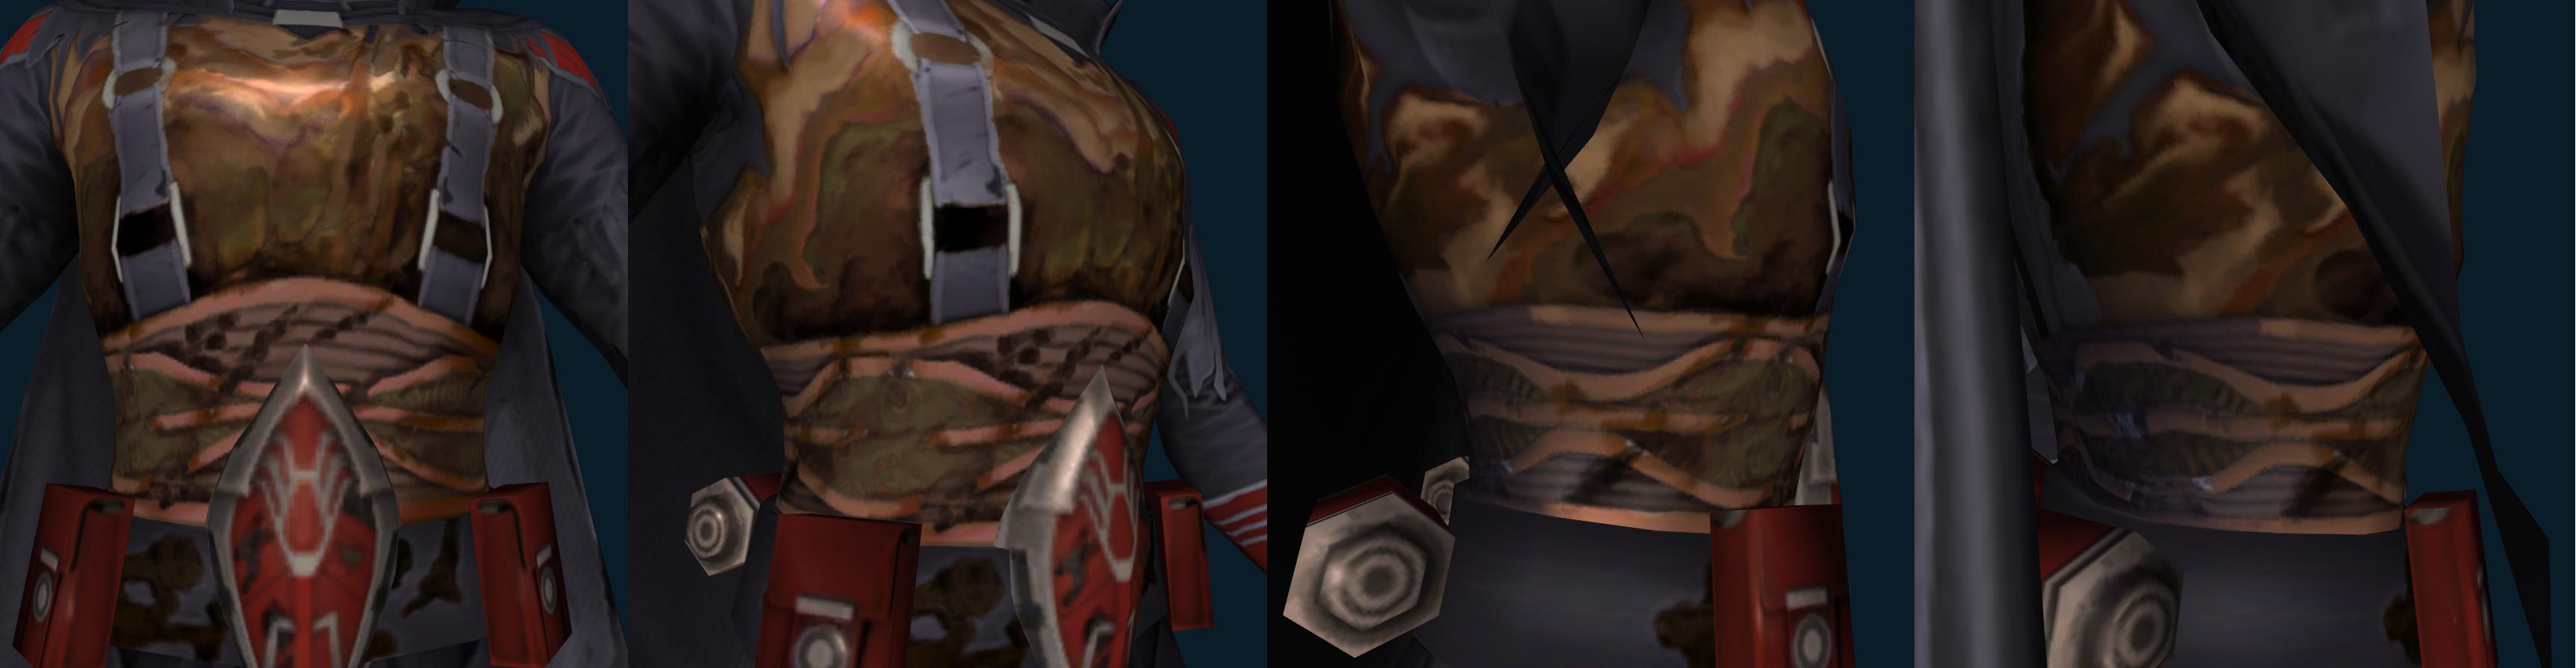 Swtor-SoR-corset-profile1.jpg